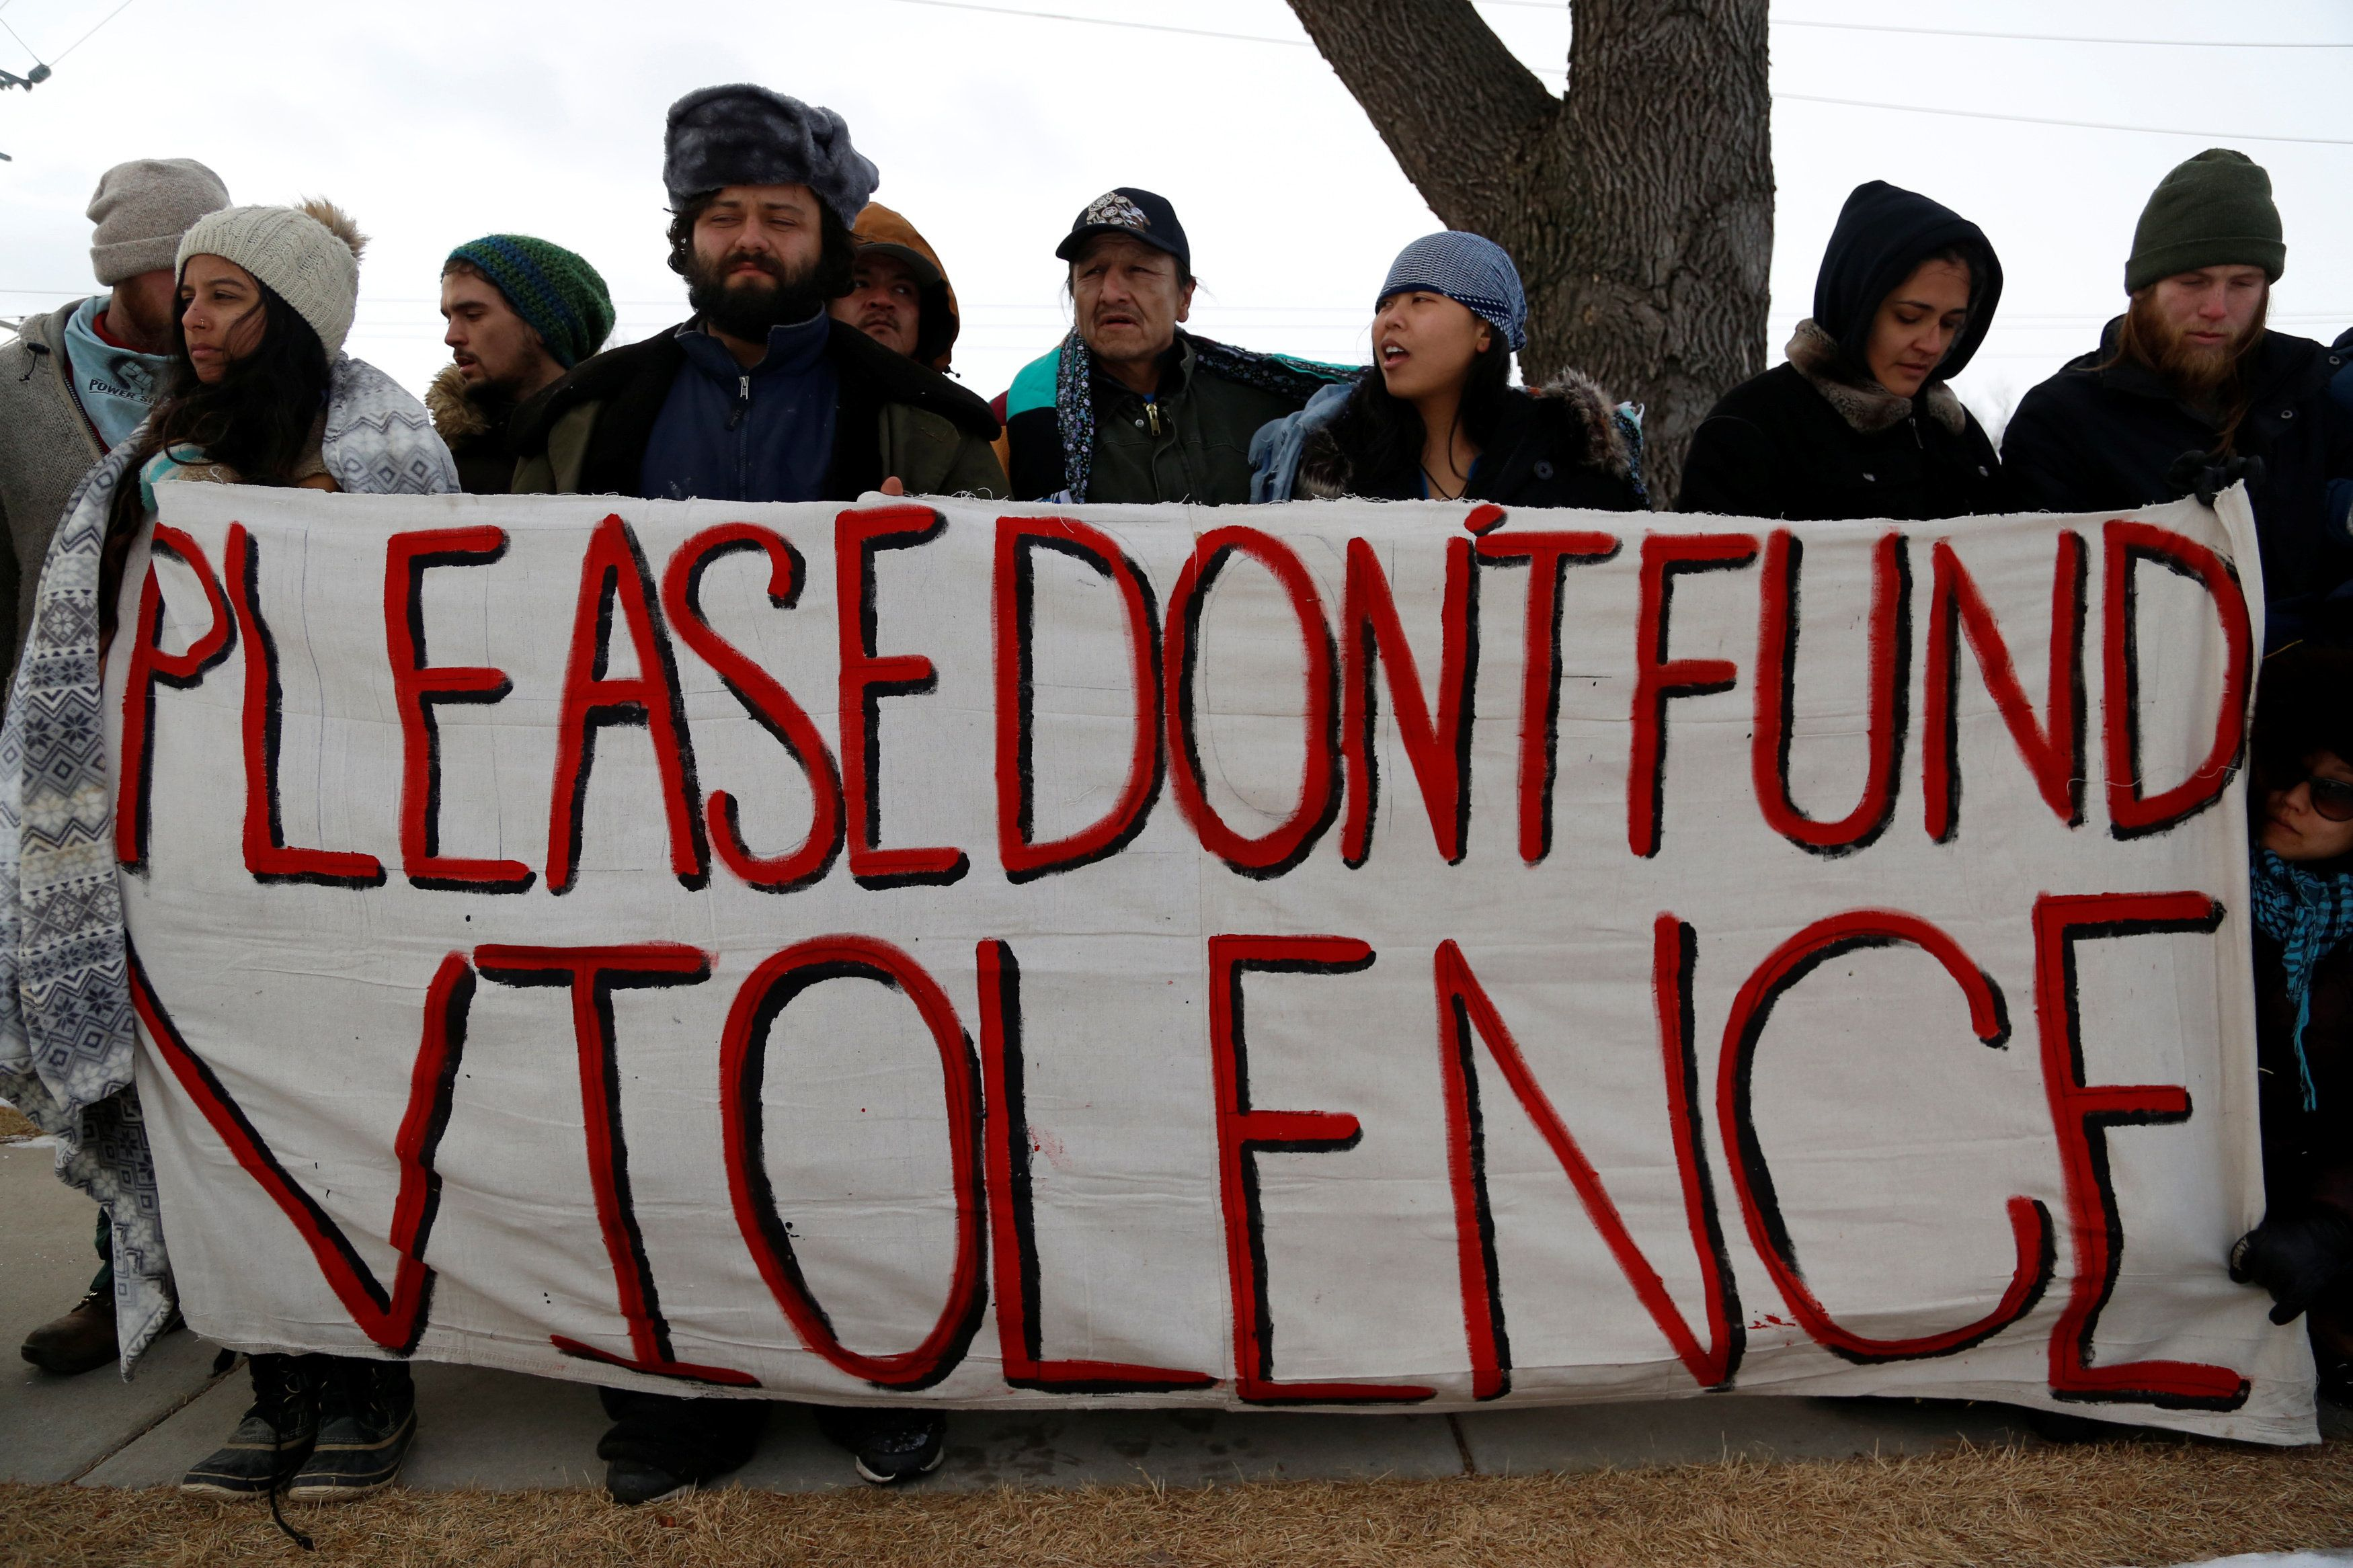 Opponents of the Dakota Access oil pipeline outside the Bank of North Dakota in Bismarck, North Dakota, January 31, 2017